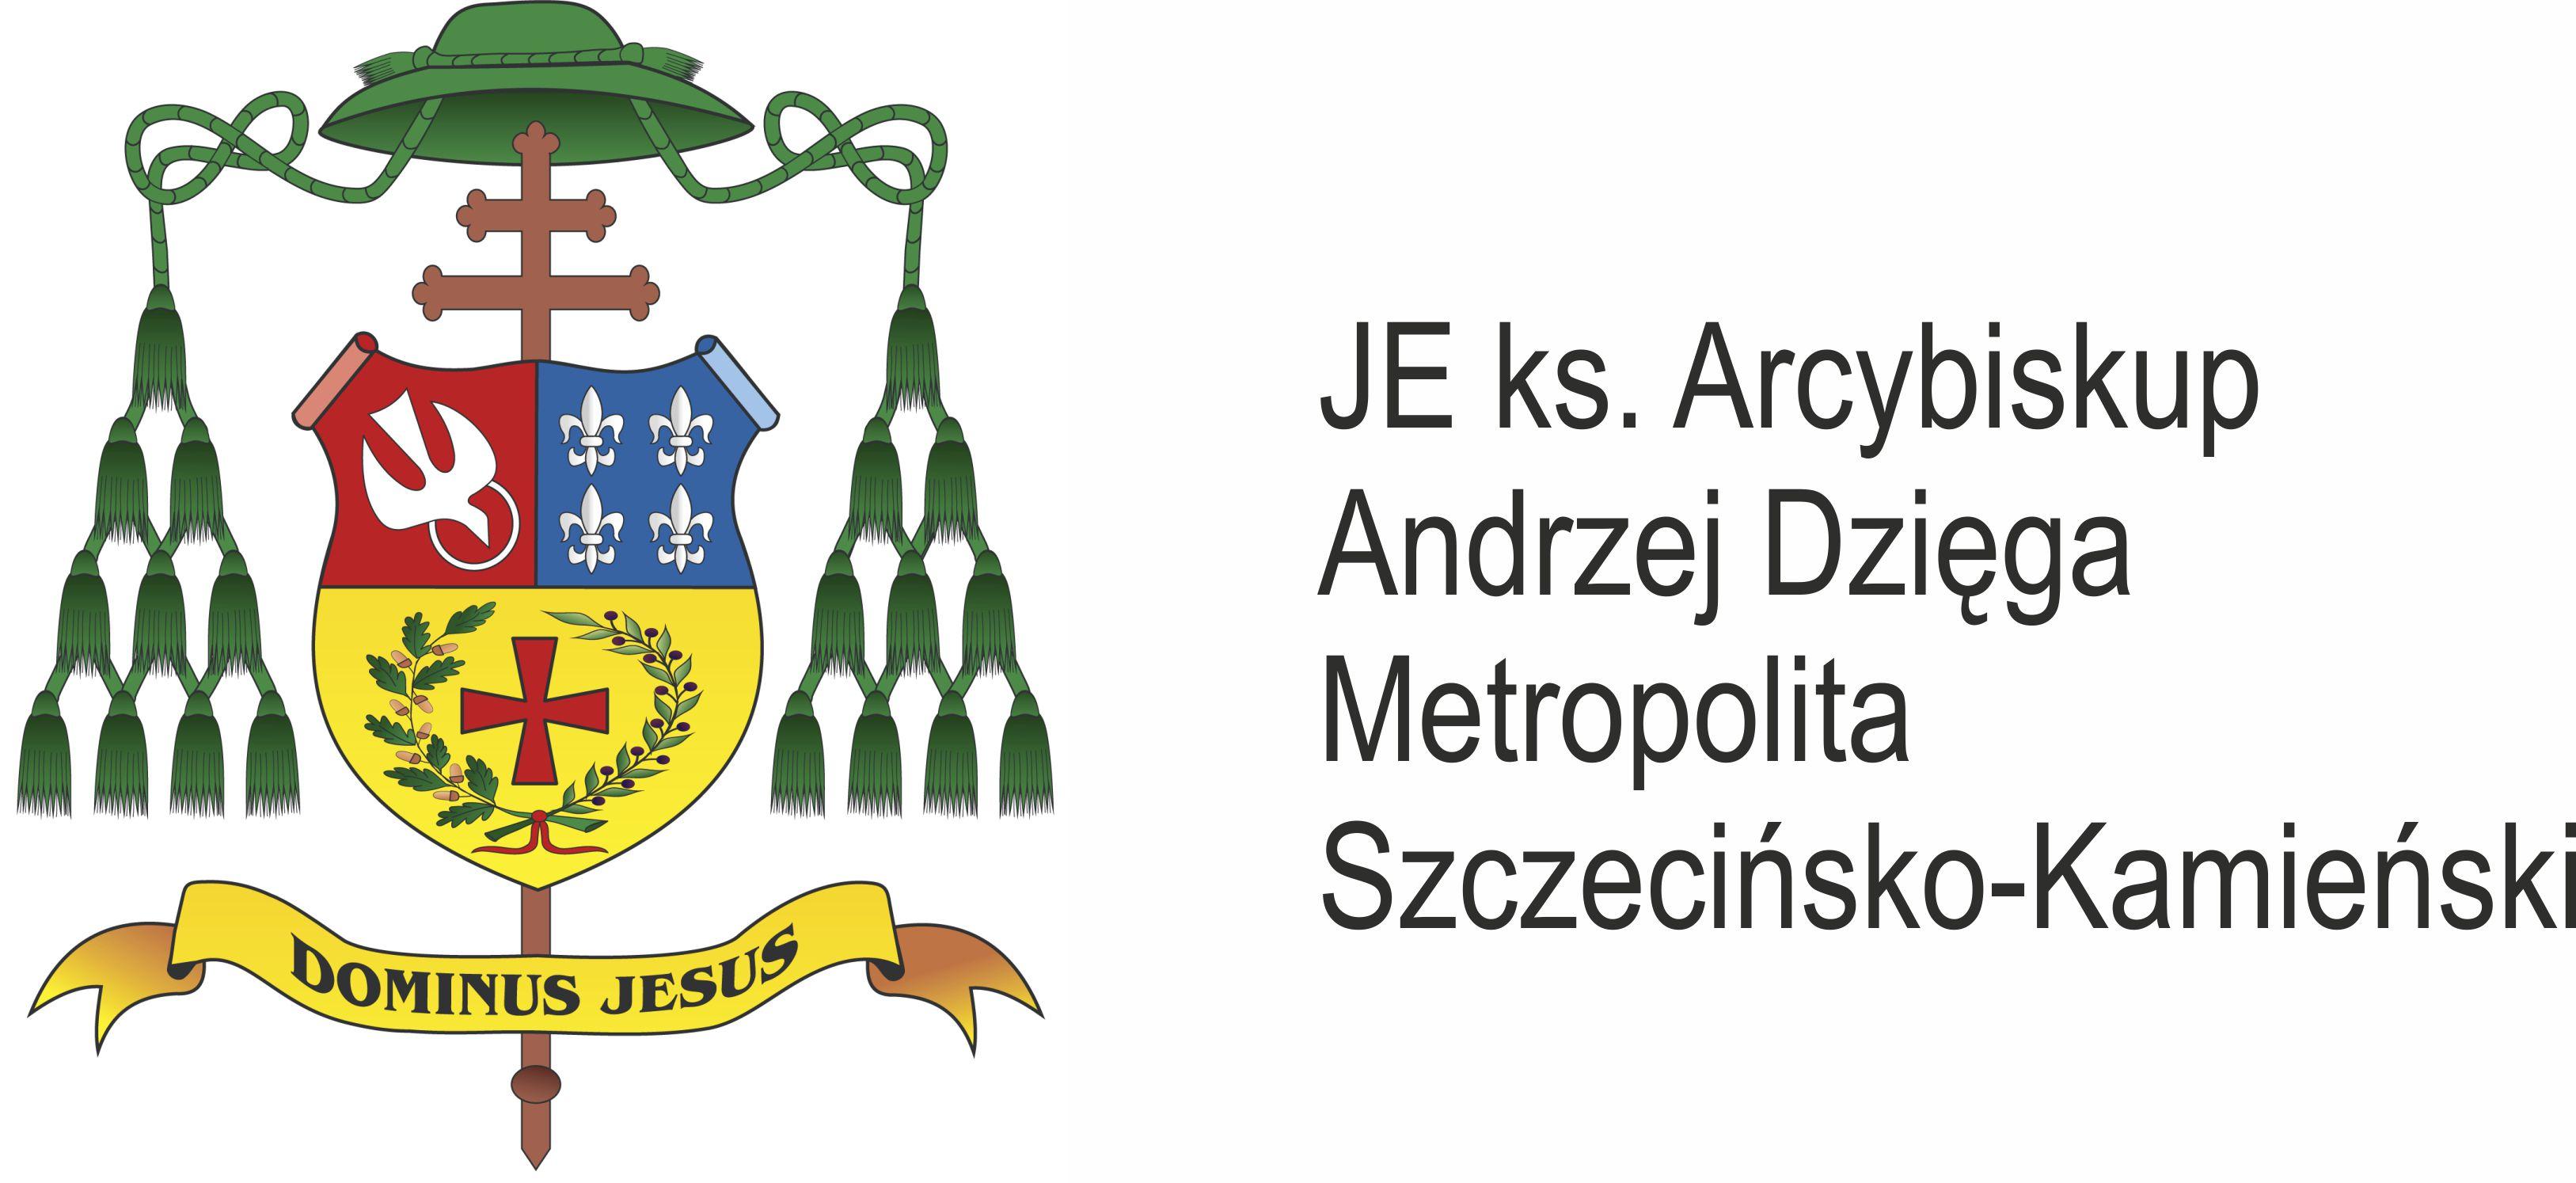 dr hab  n  med  jerzy sie u0144ko  u2013 quo vadis cz u0142owieku